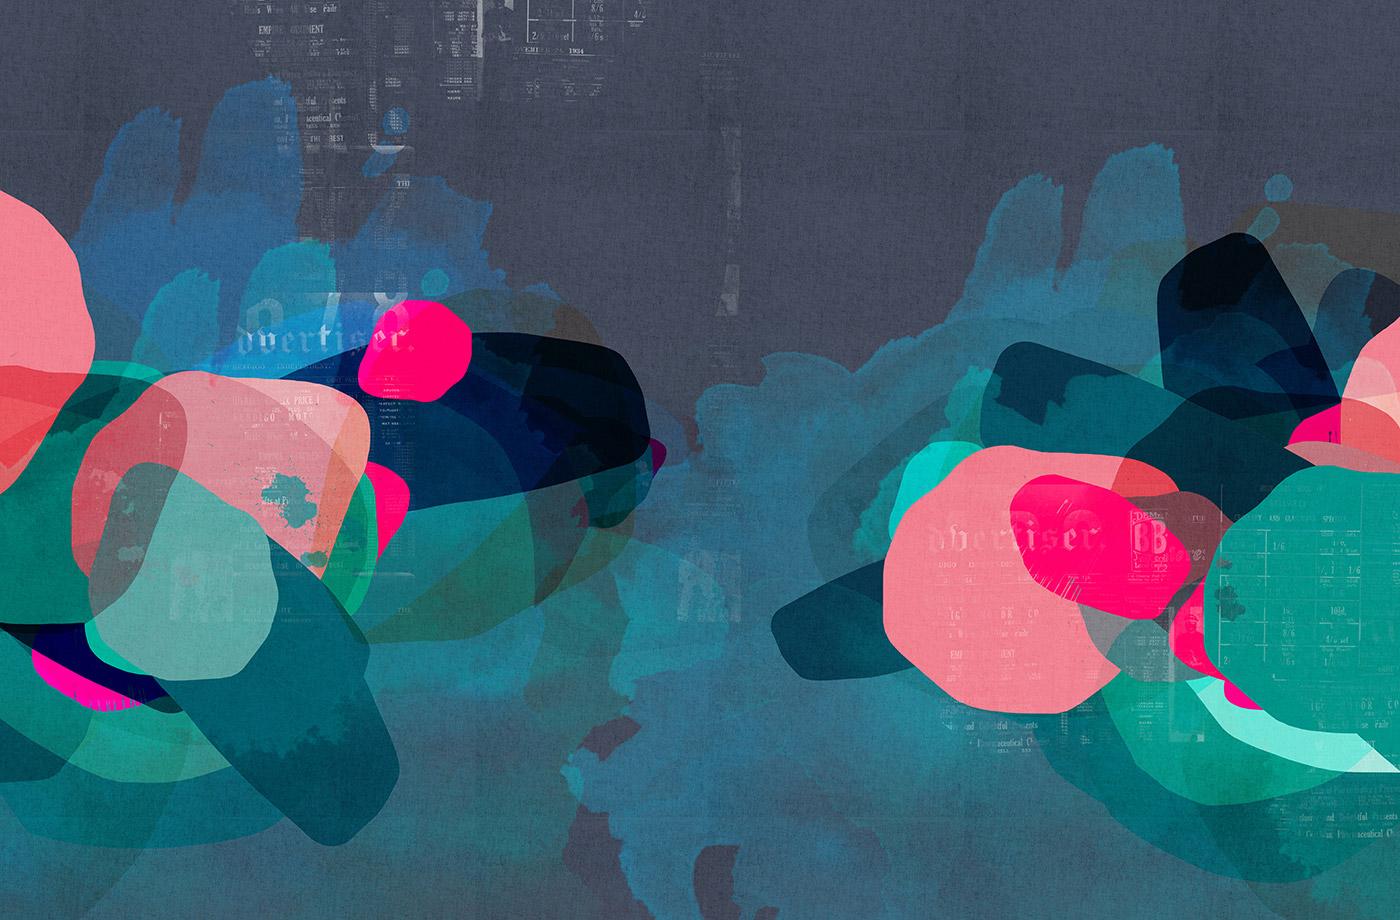 Midnight Bay, 2015  Pigment print on archival rag  95cm x 140cm / 1 of 15 65cm x 95cm / 1 of 50 50cm x 70cm / 1of 100